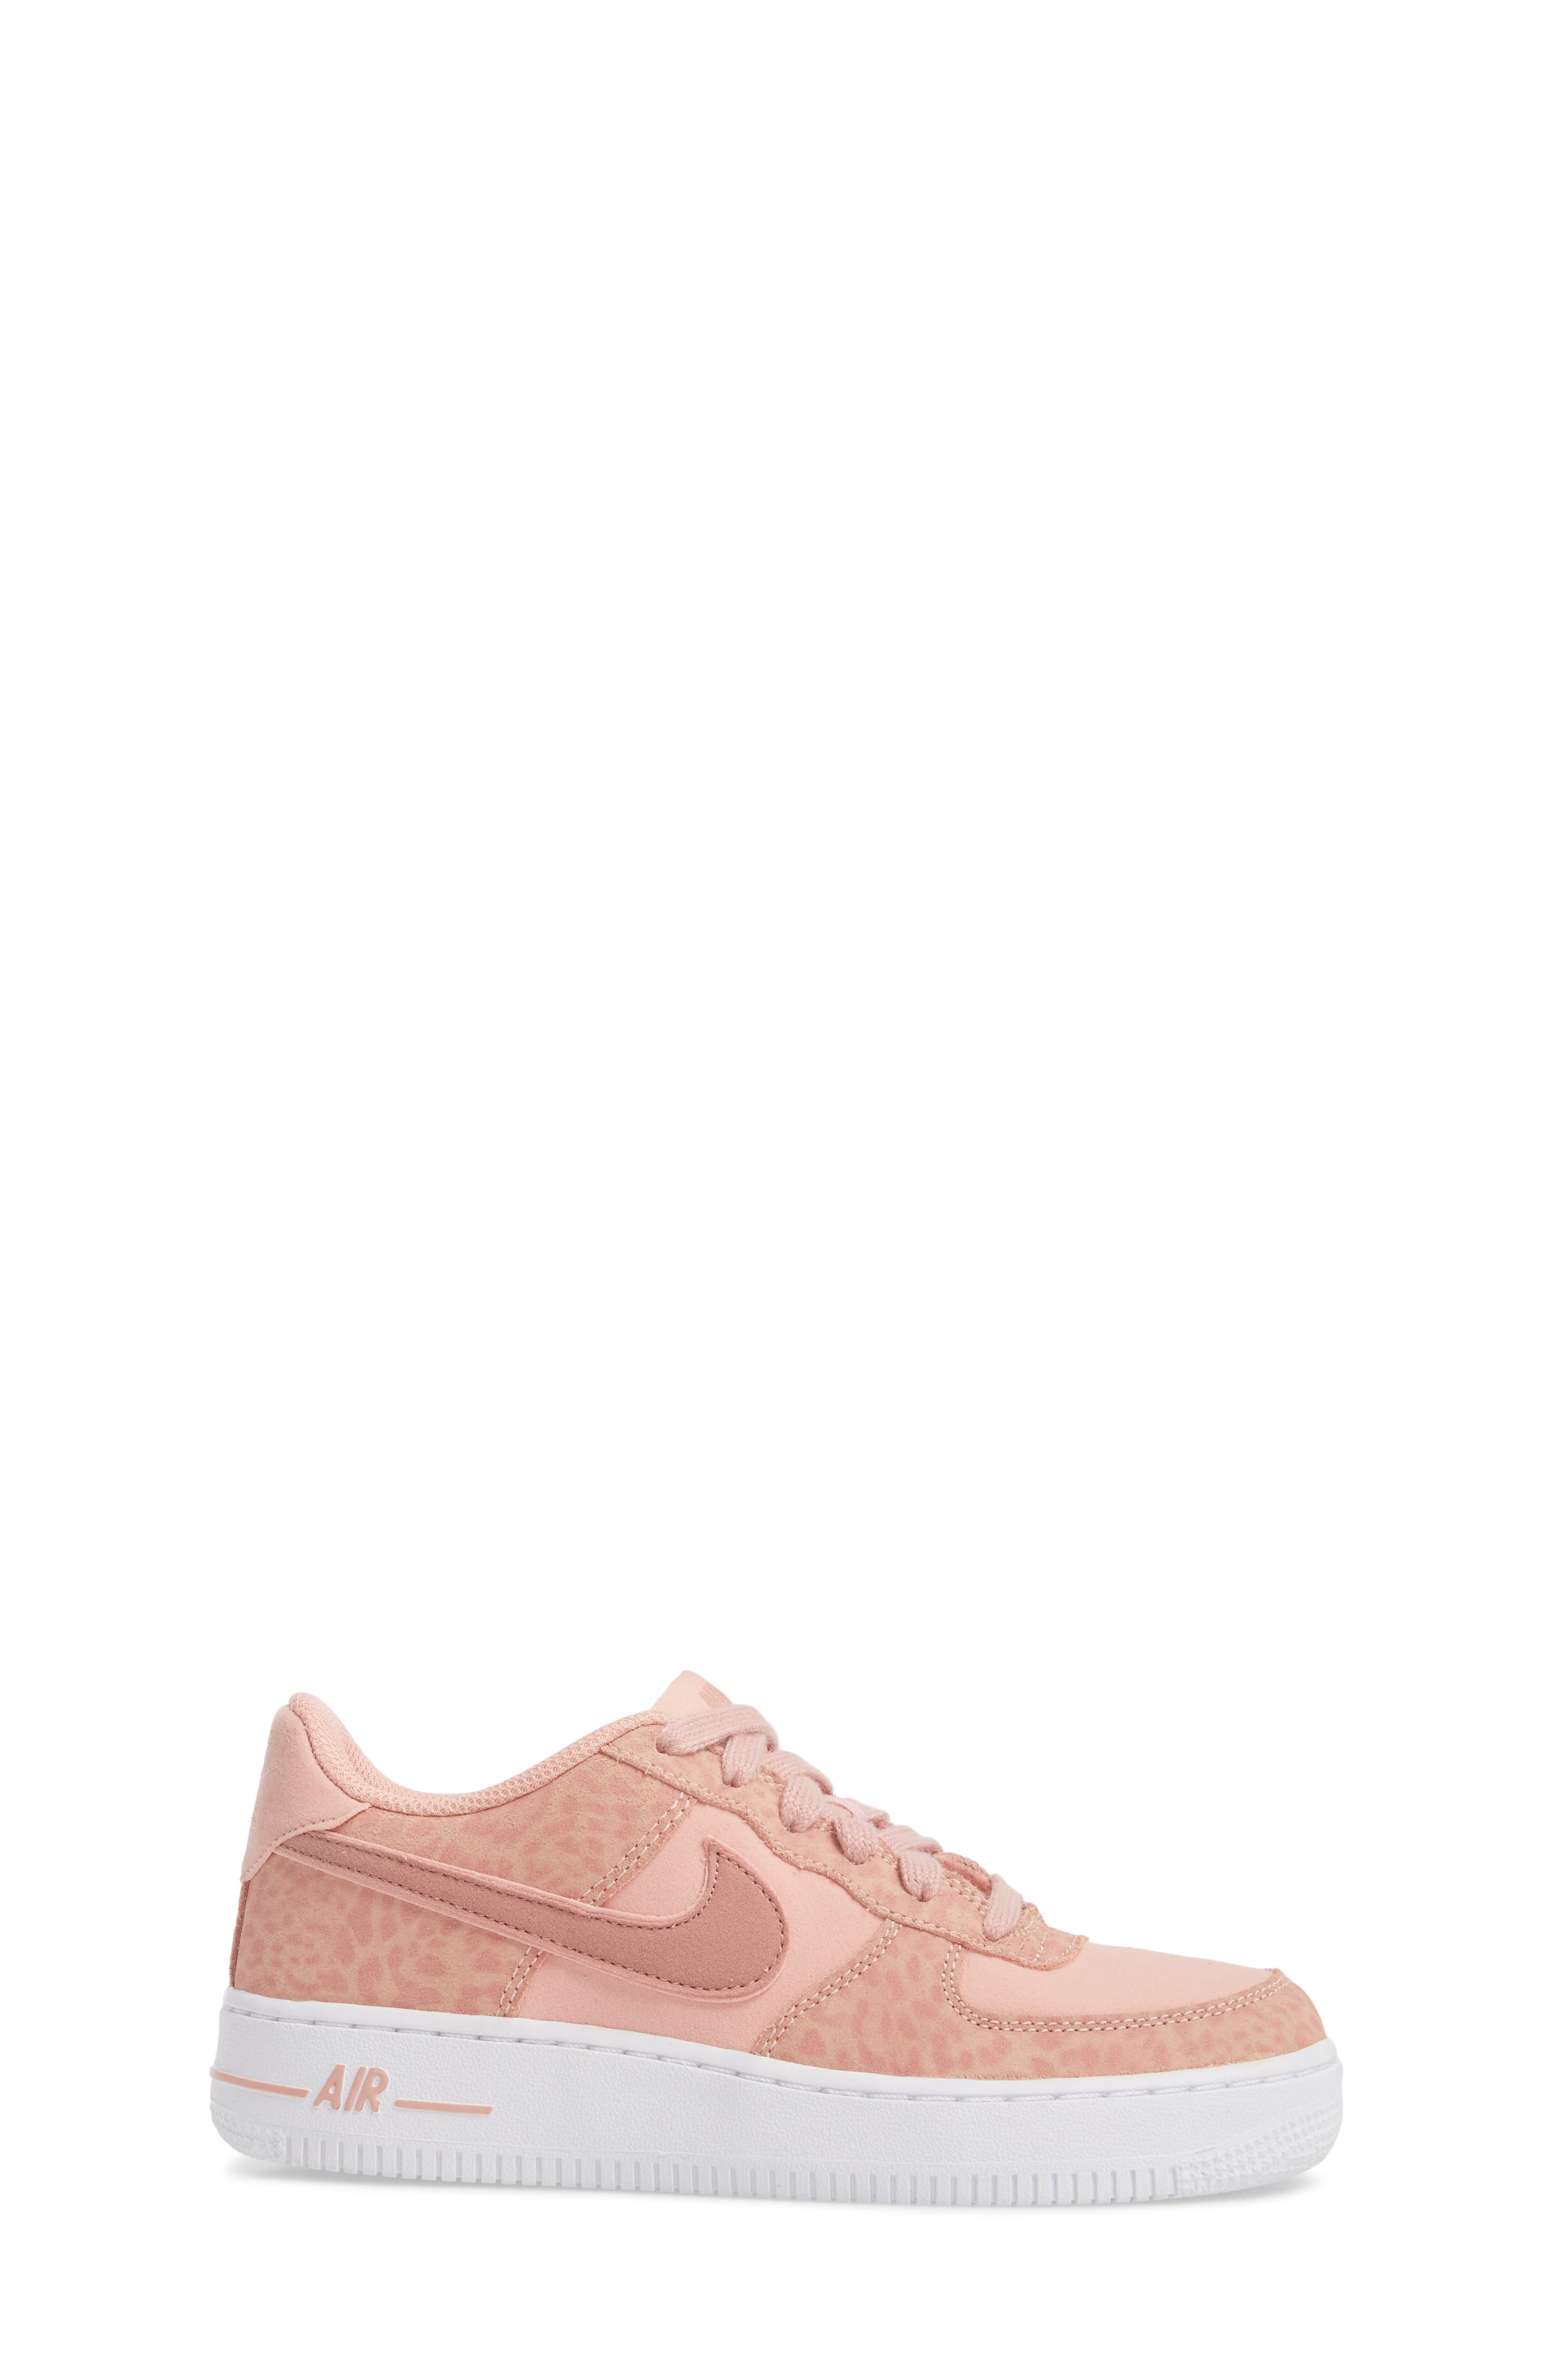 Air Force 1 LV8 Sneaker,                             Alternate thumbnail 15, color,